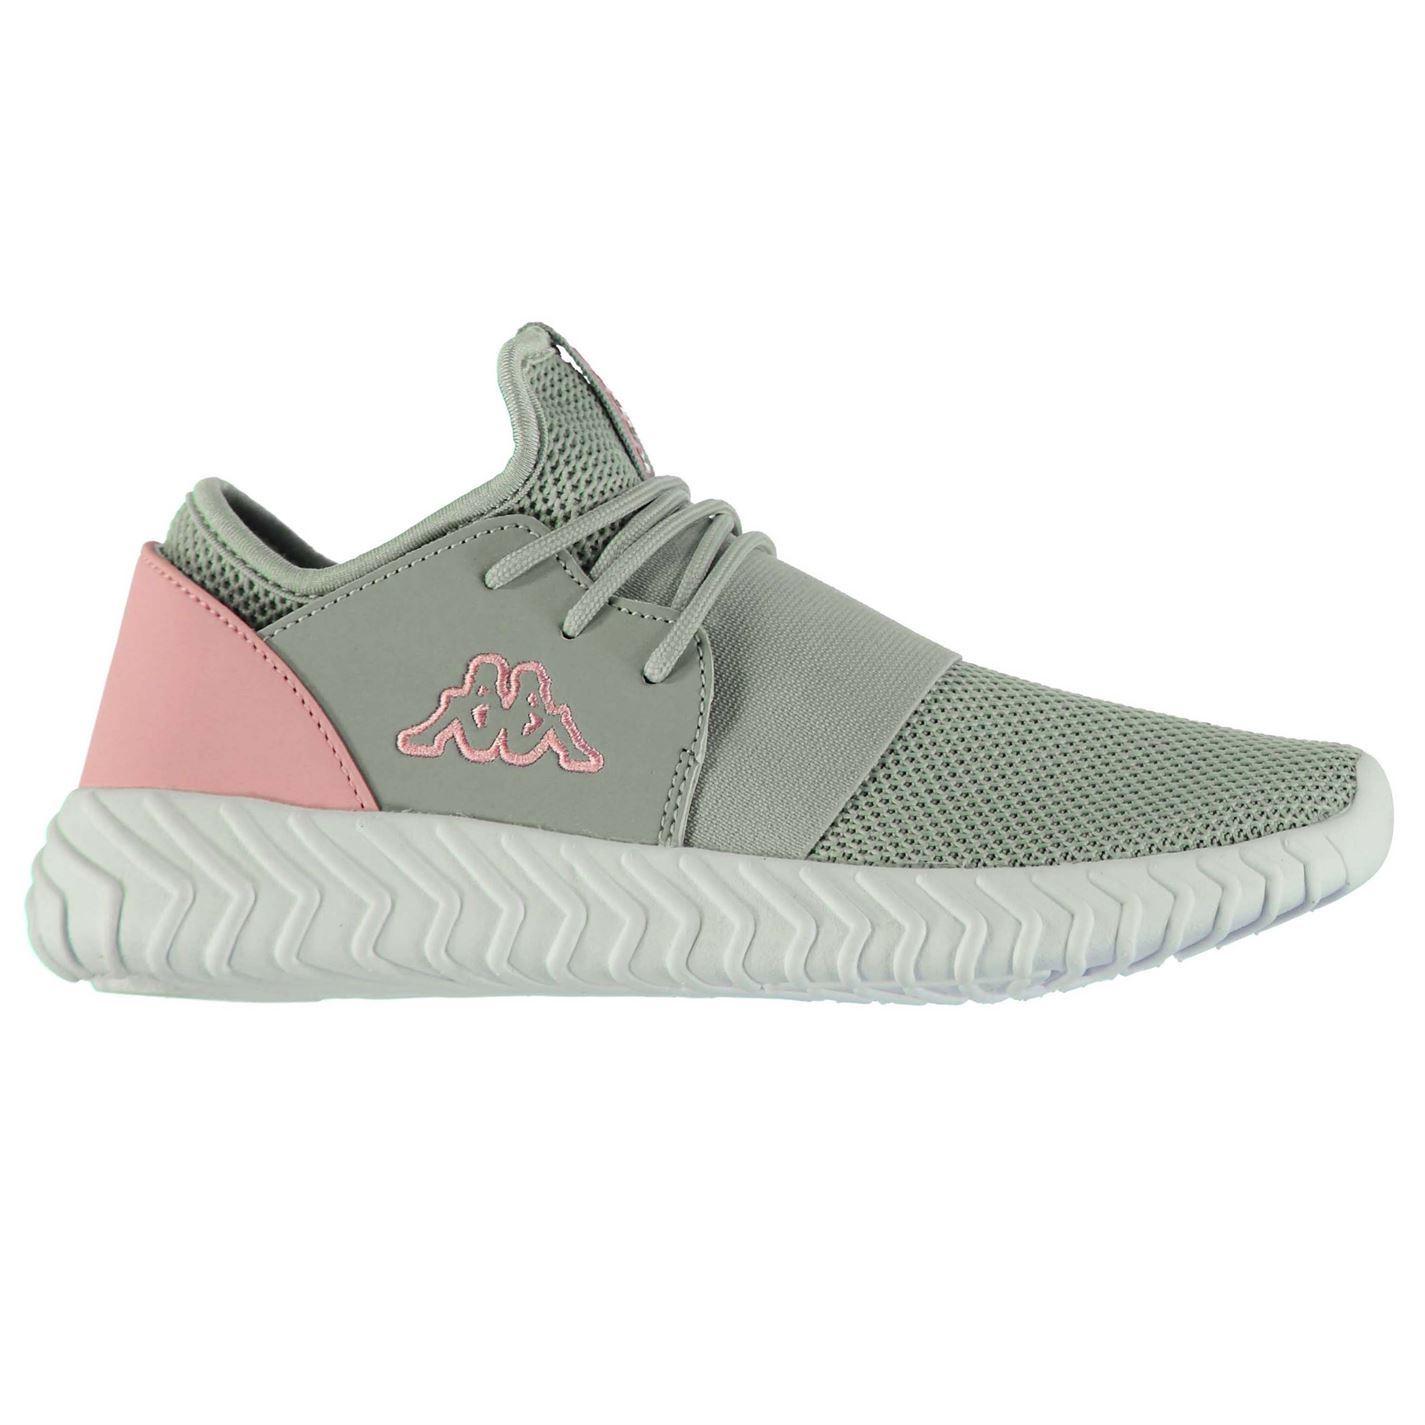 Kappa-Femme-Lena-Trainers-Runners-Lacets-Chaussures-Quotidien-Leger-Textile